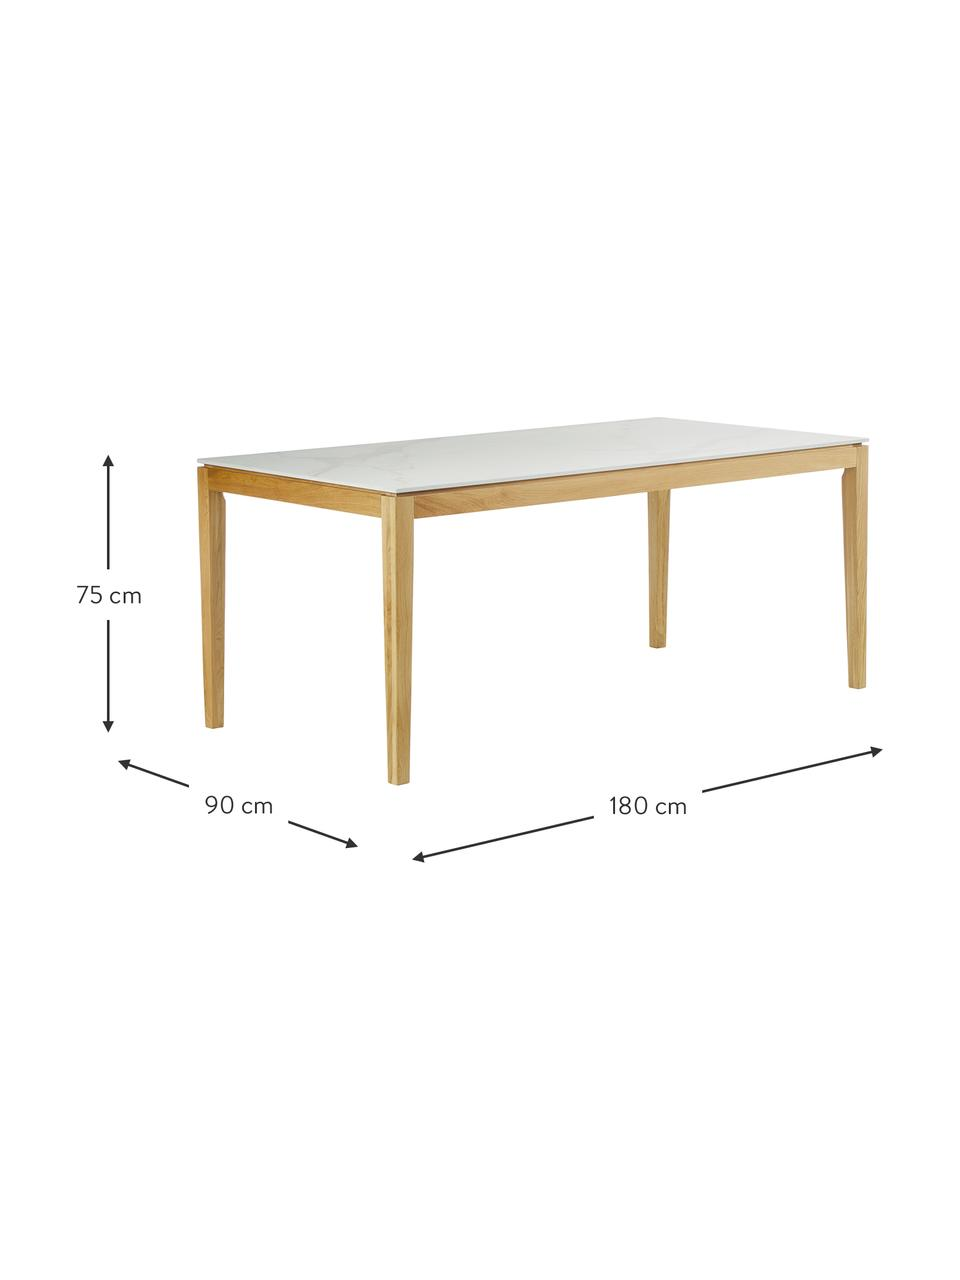 Tavolo con effetto marmo Jackson, Bianco, Larg. 180 x Prof. 90 cm